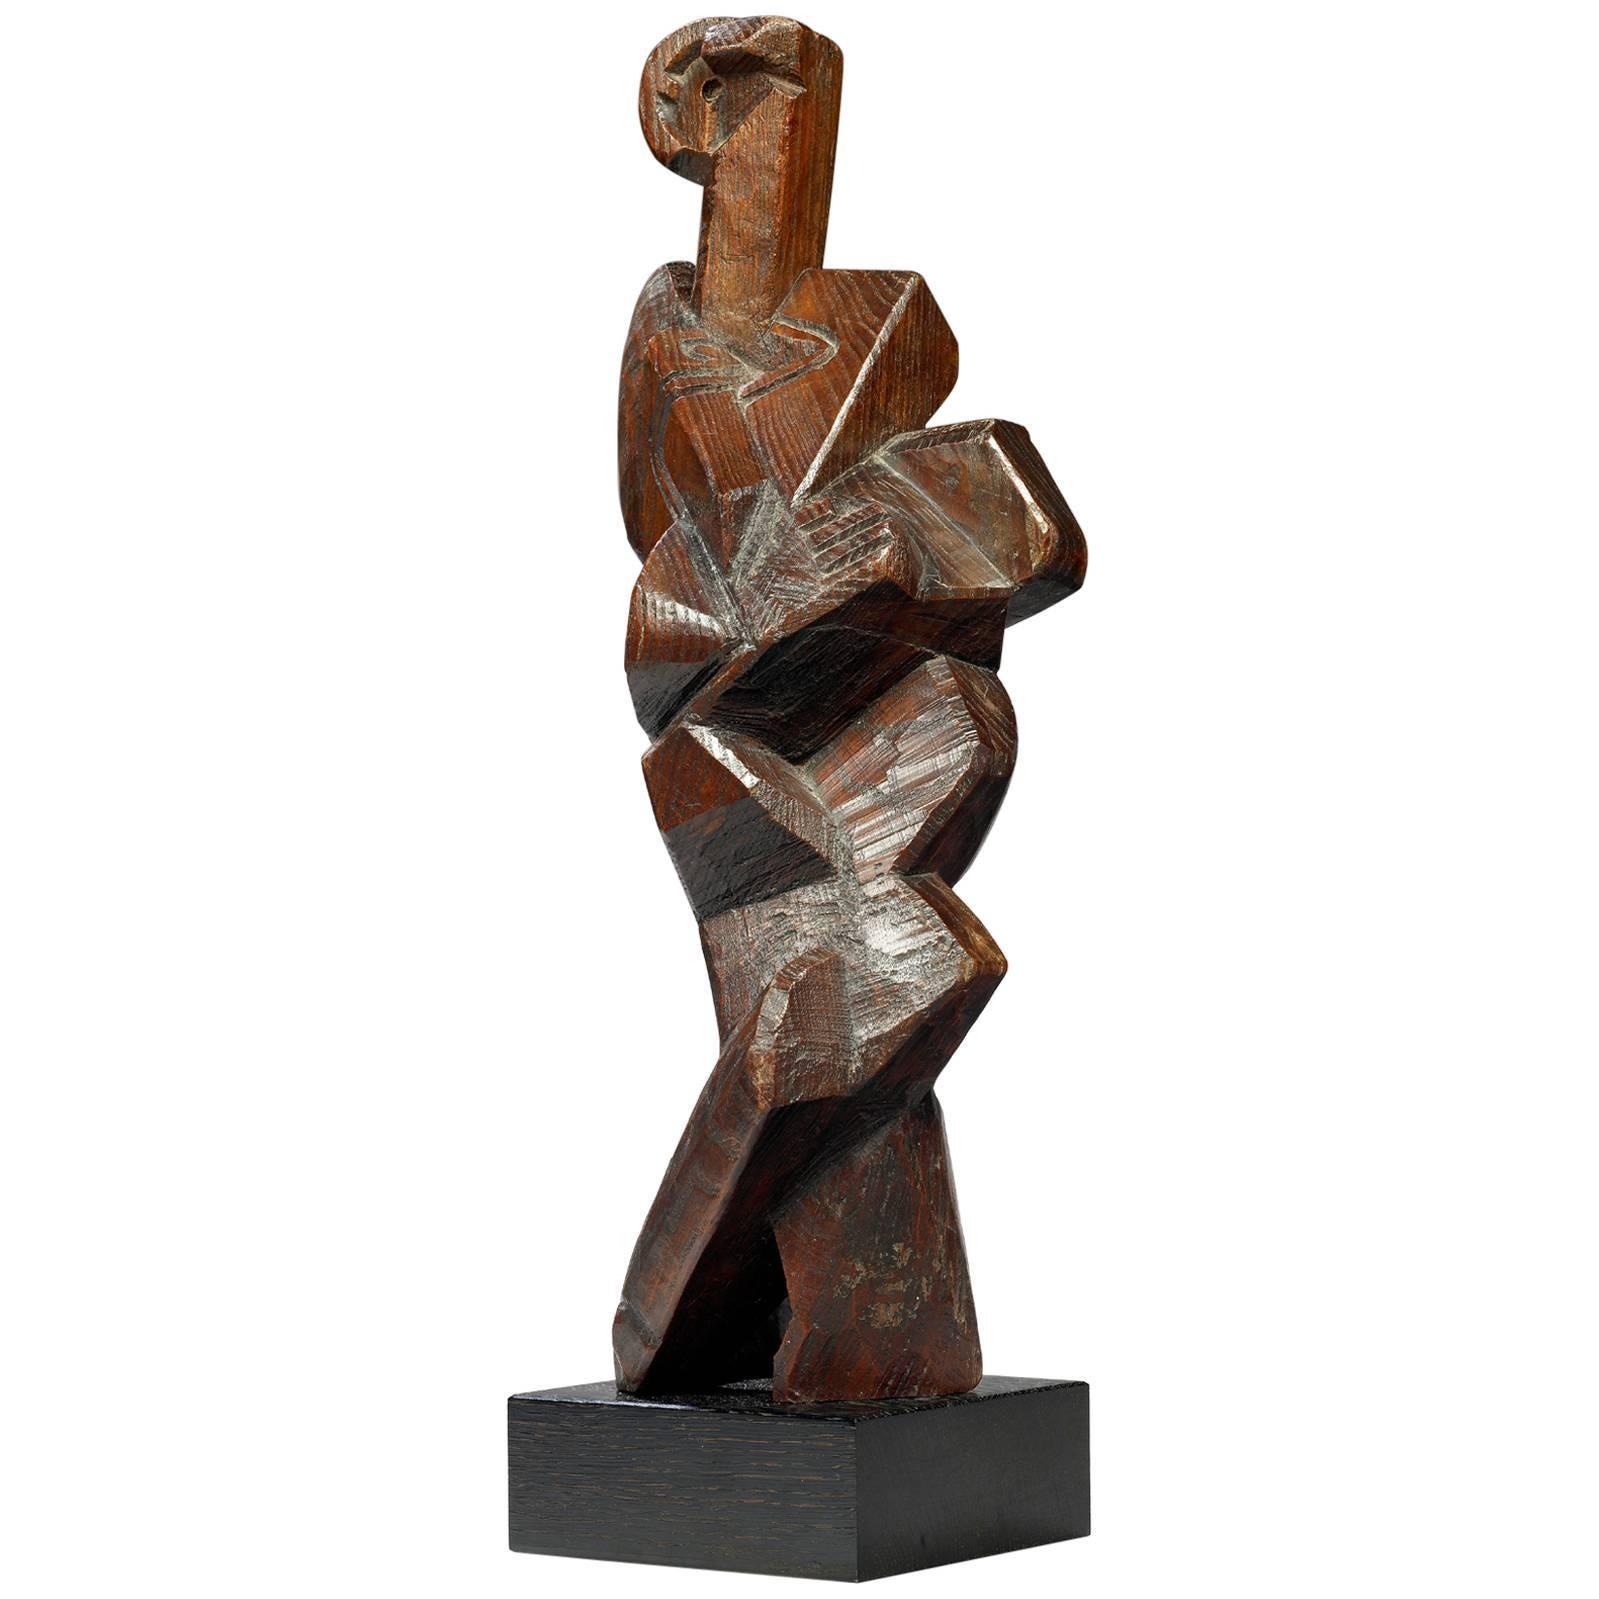 Léon Borgey, Homme Debout 'Standing Man,' 1919, Bronze n°2/8